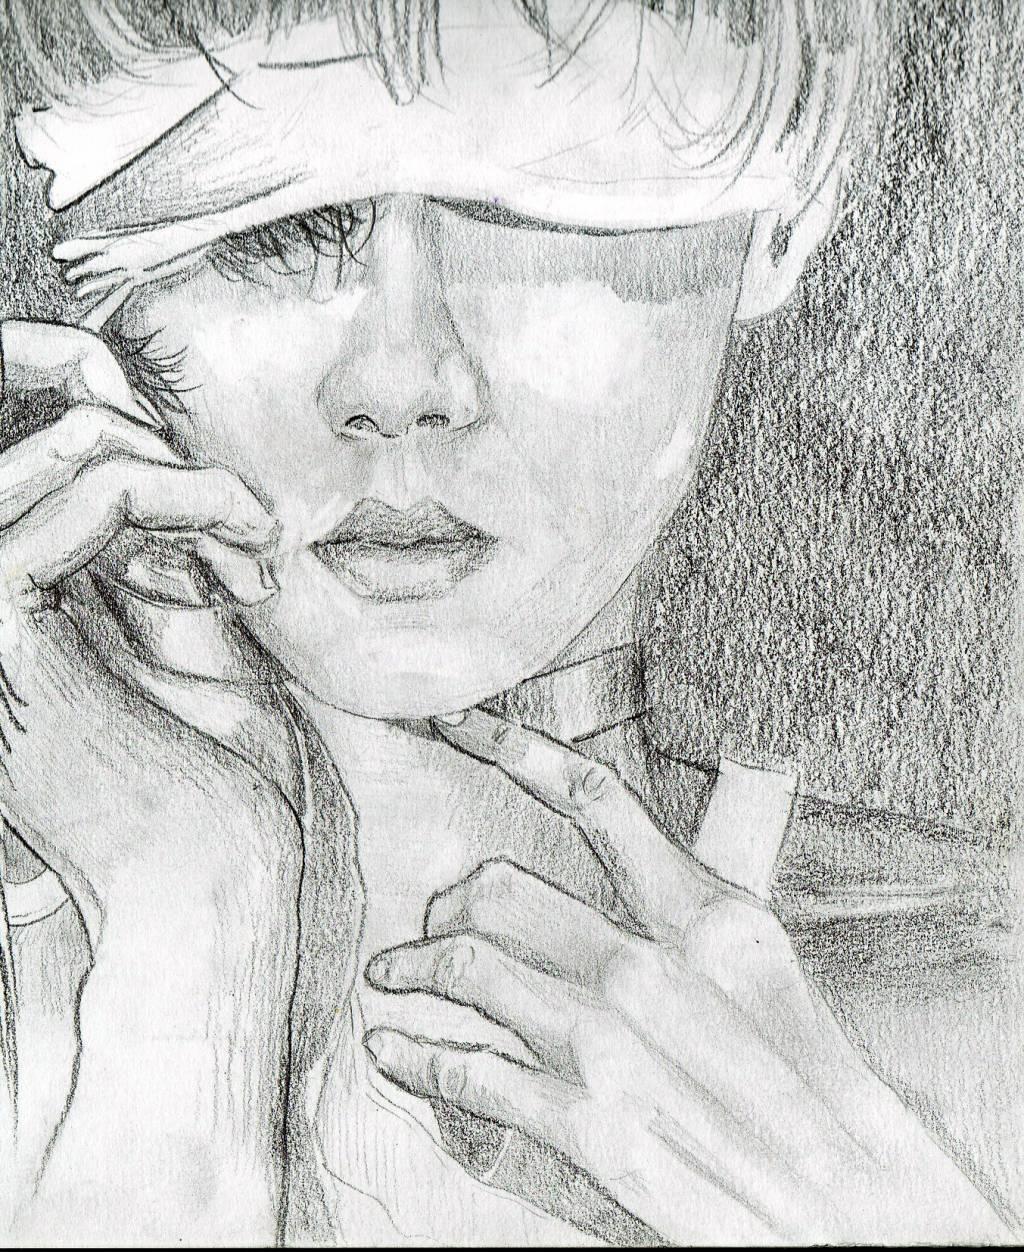 cara mujer sobre un dibujo de Marcos Rey iñigo telleria - Artelista.com